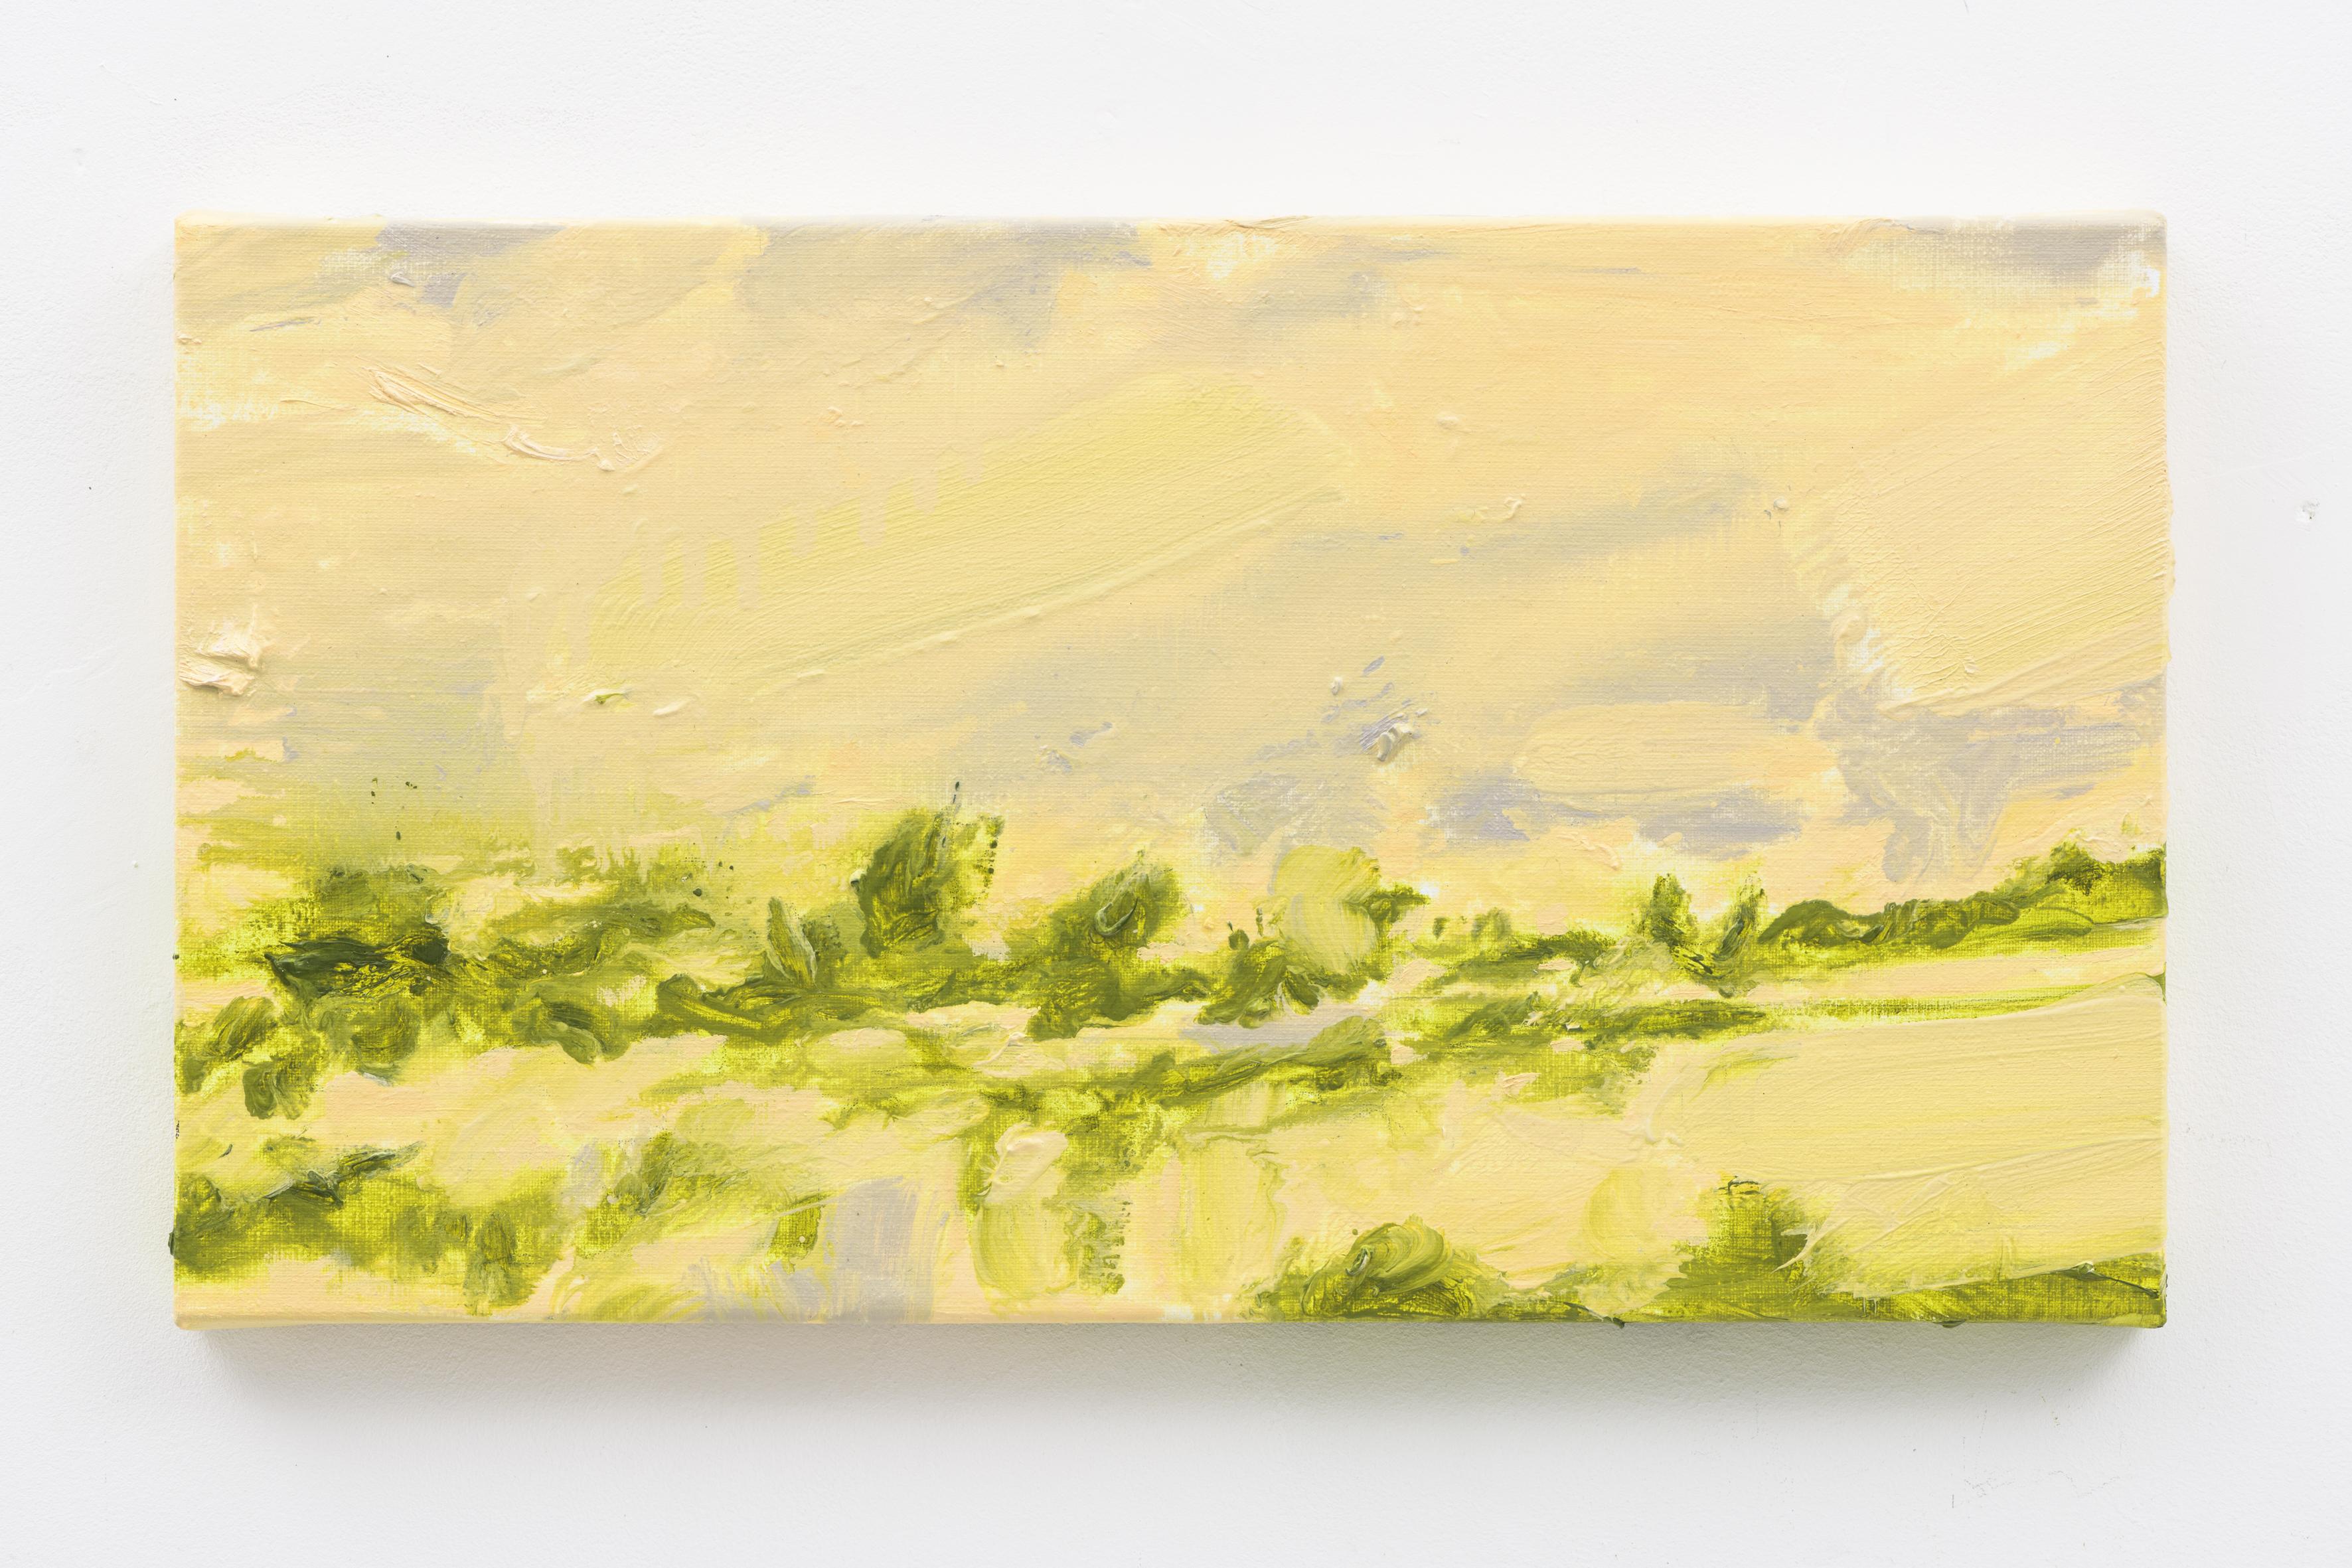 """Oude Buisse Heide IV"" 25 x 45 cm. oil on linen 2017 (Air Van GoghHuis)"